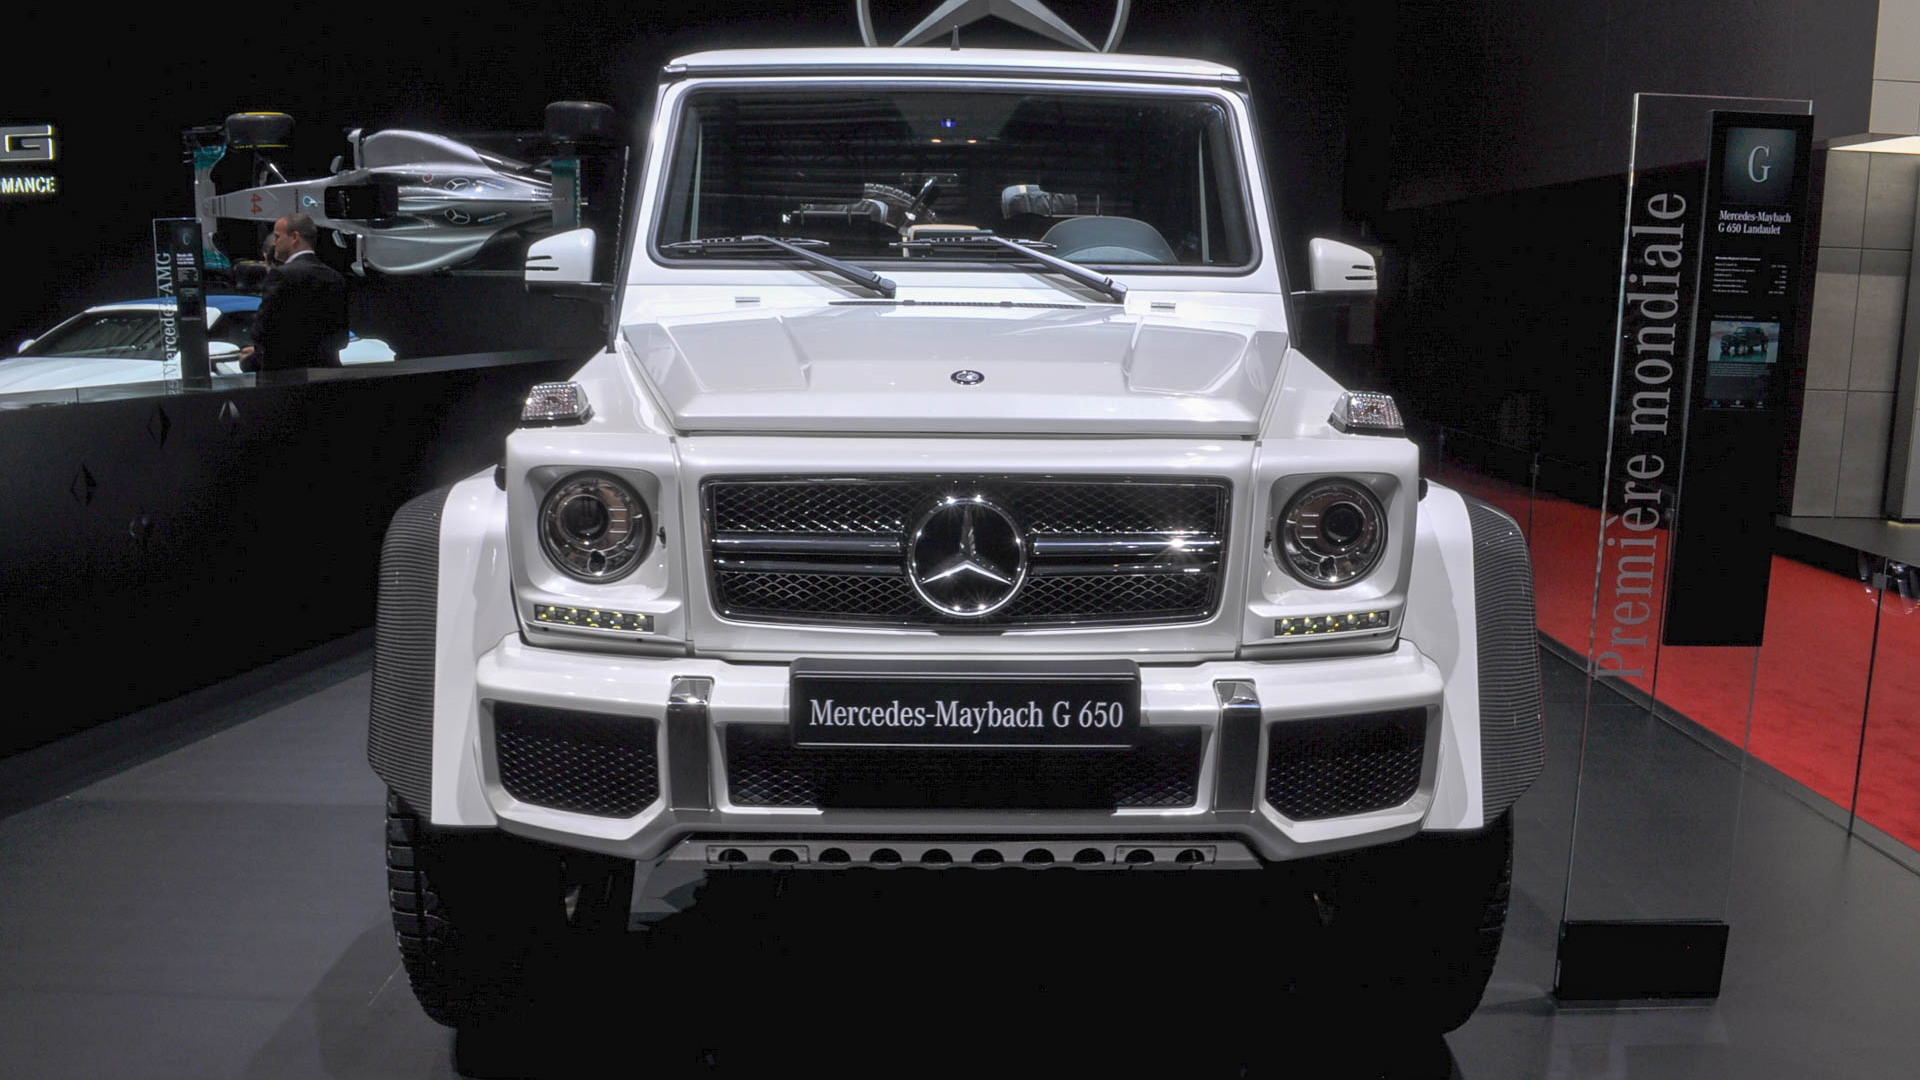 Mercedes-Maybach G650 Landaulet, 2017 Geneva auto show